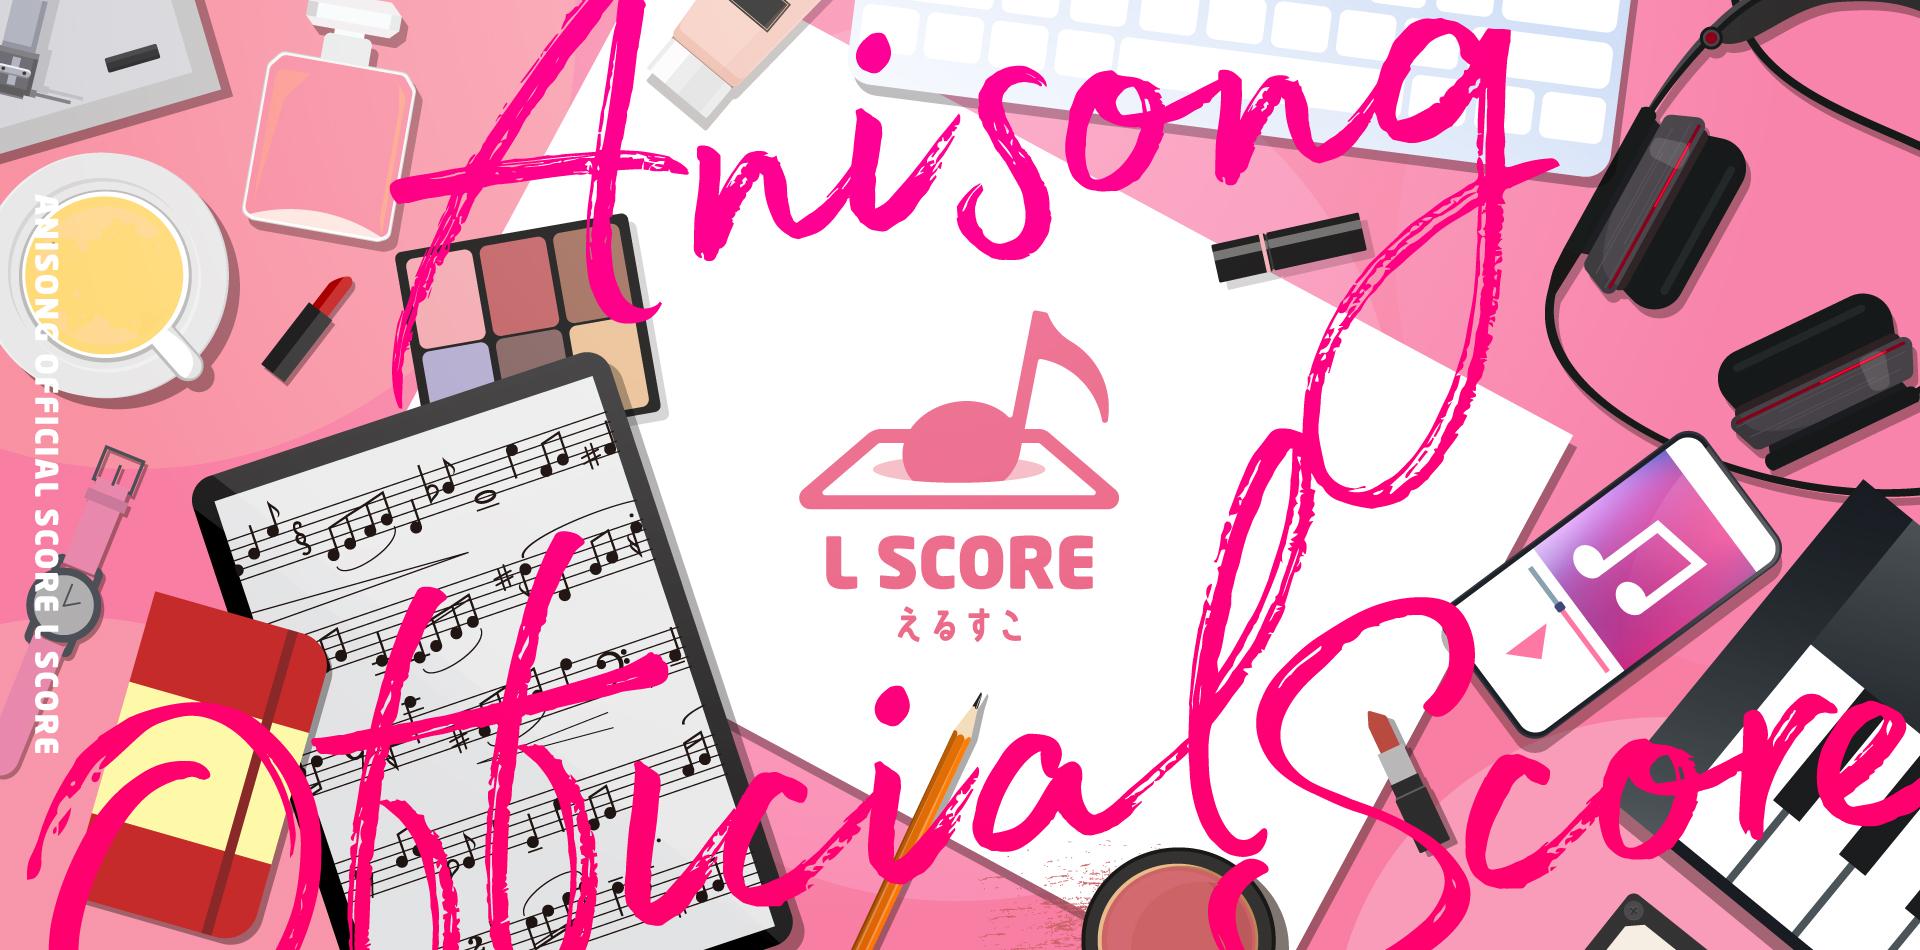 "Lantis厂牌下乐谱品牌""L SCORE""从2月起正式展开 BANDAI NAMCO Arts ACG资讯 第1张"